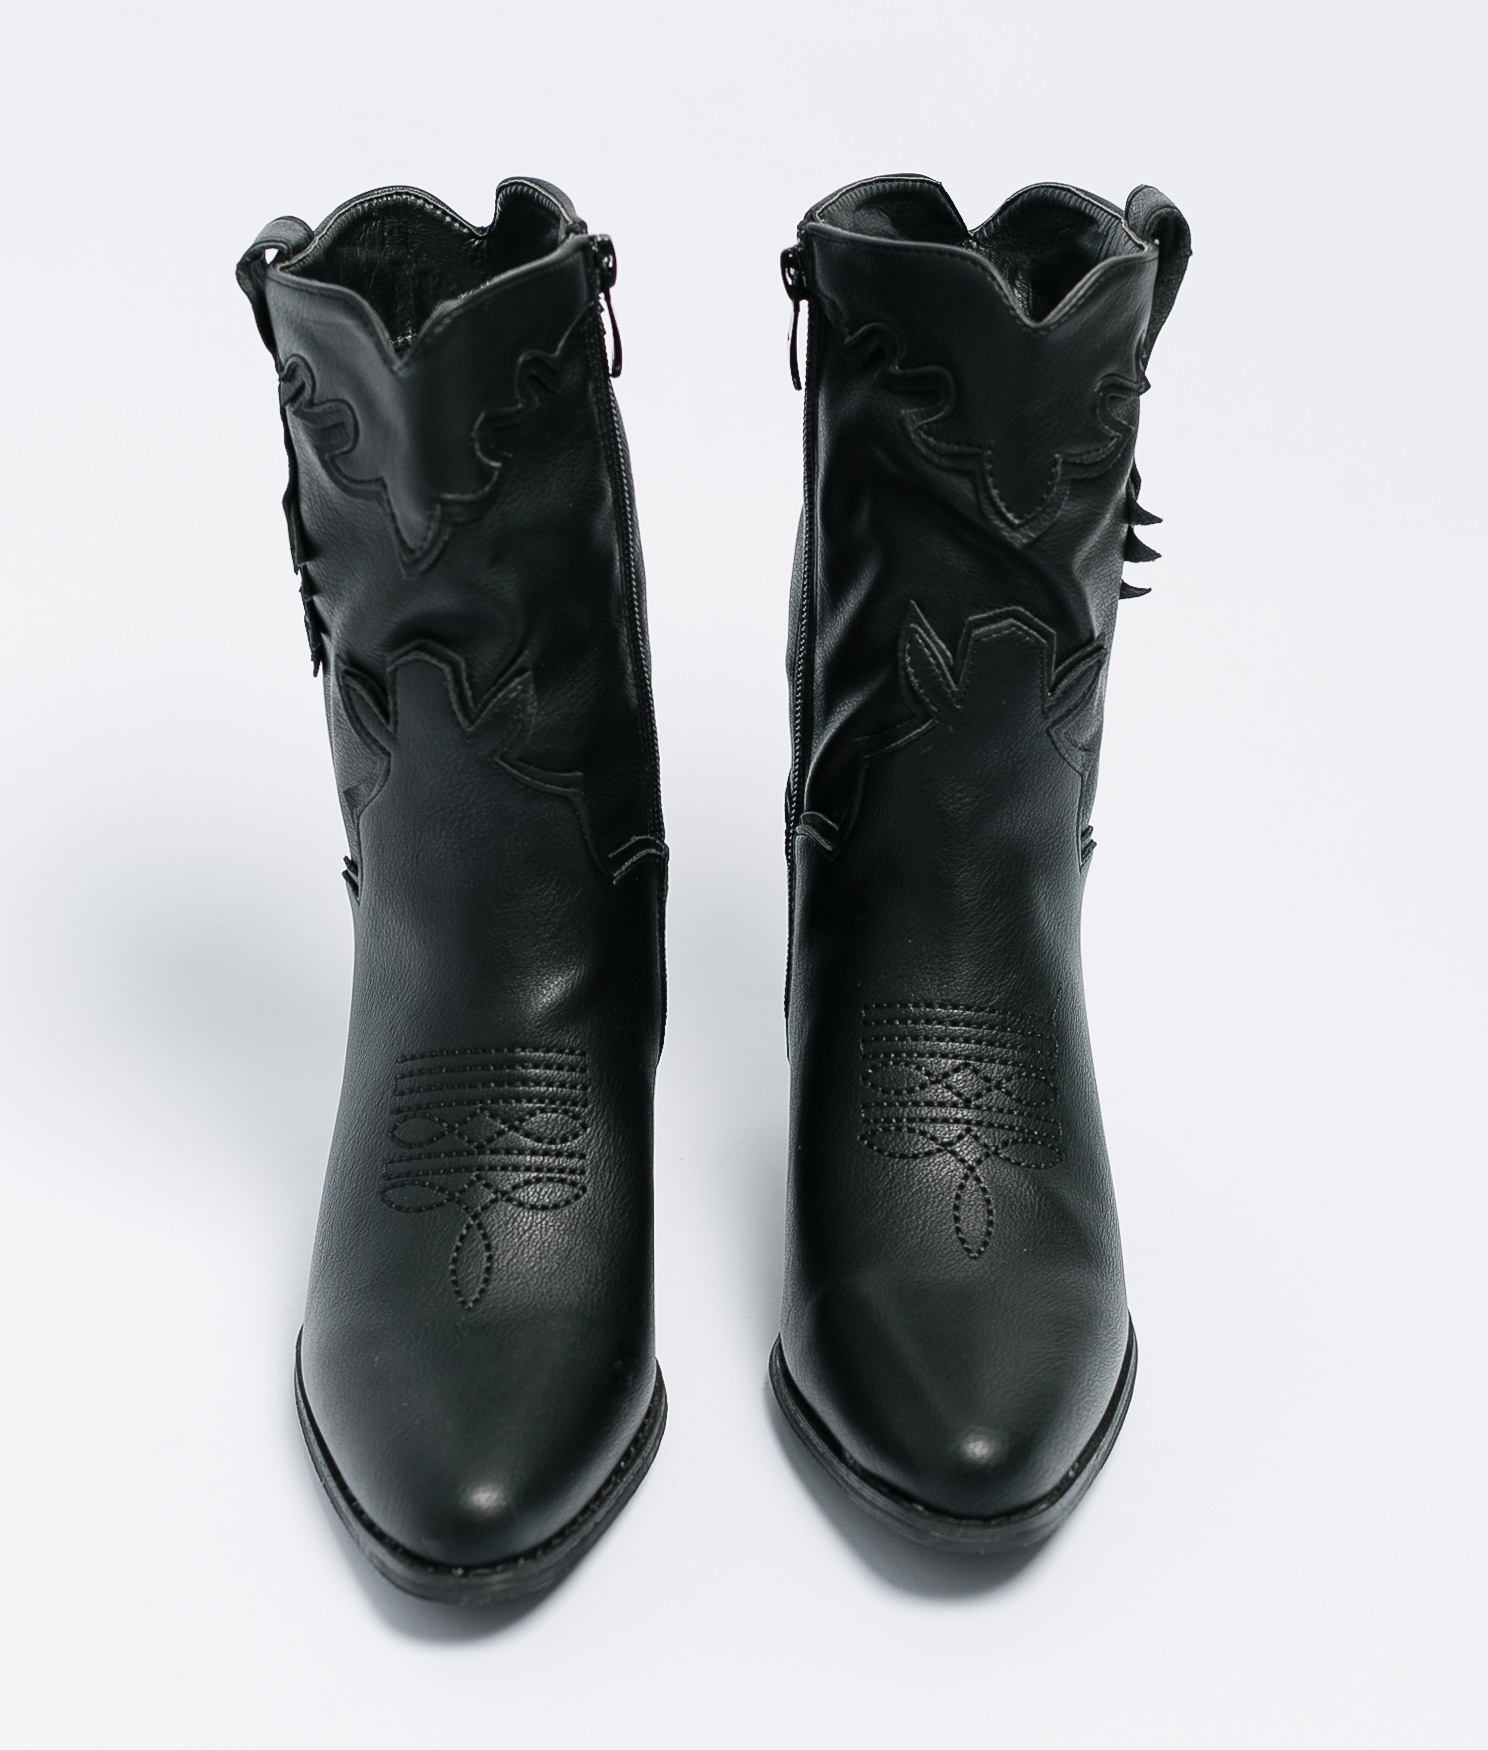 Low Boot Malia - Black